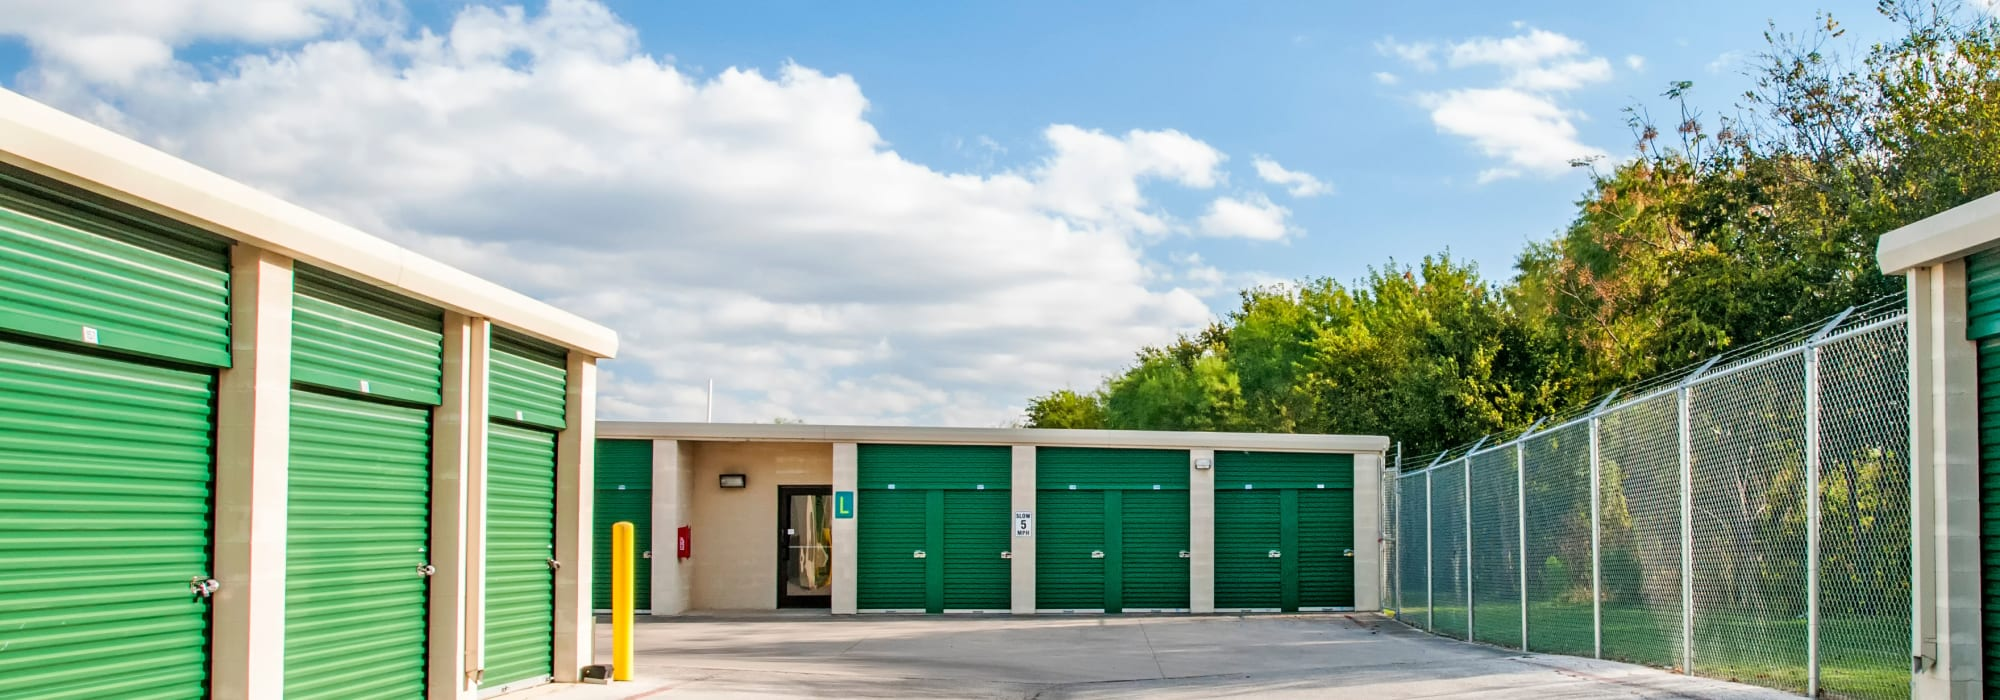 Outside storage units with green doors at Lockaway Storage in San Antonio, Texas